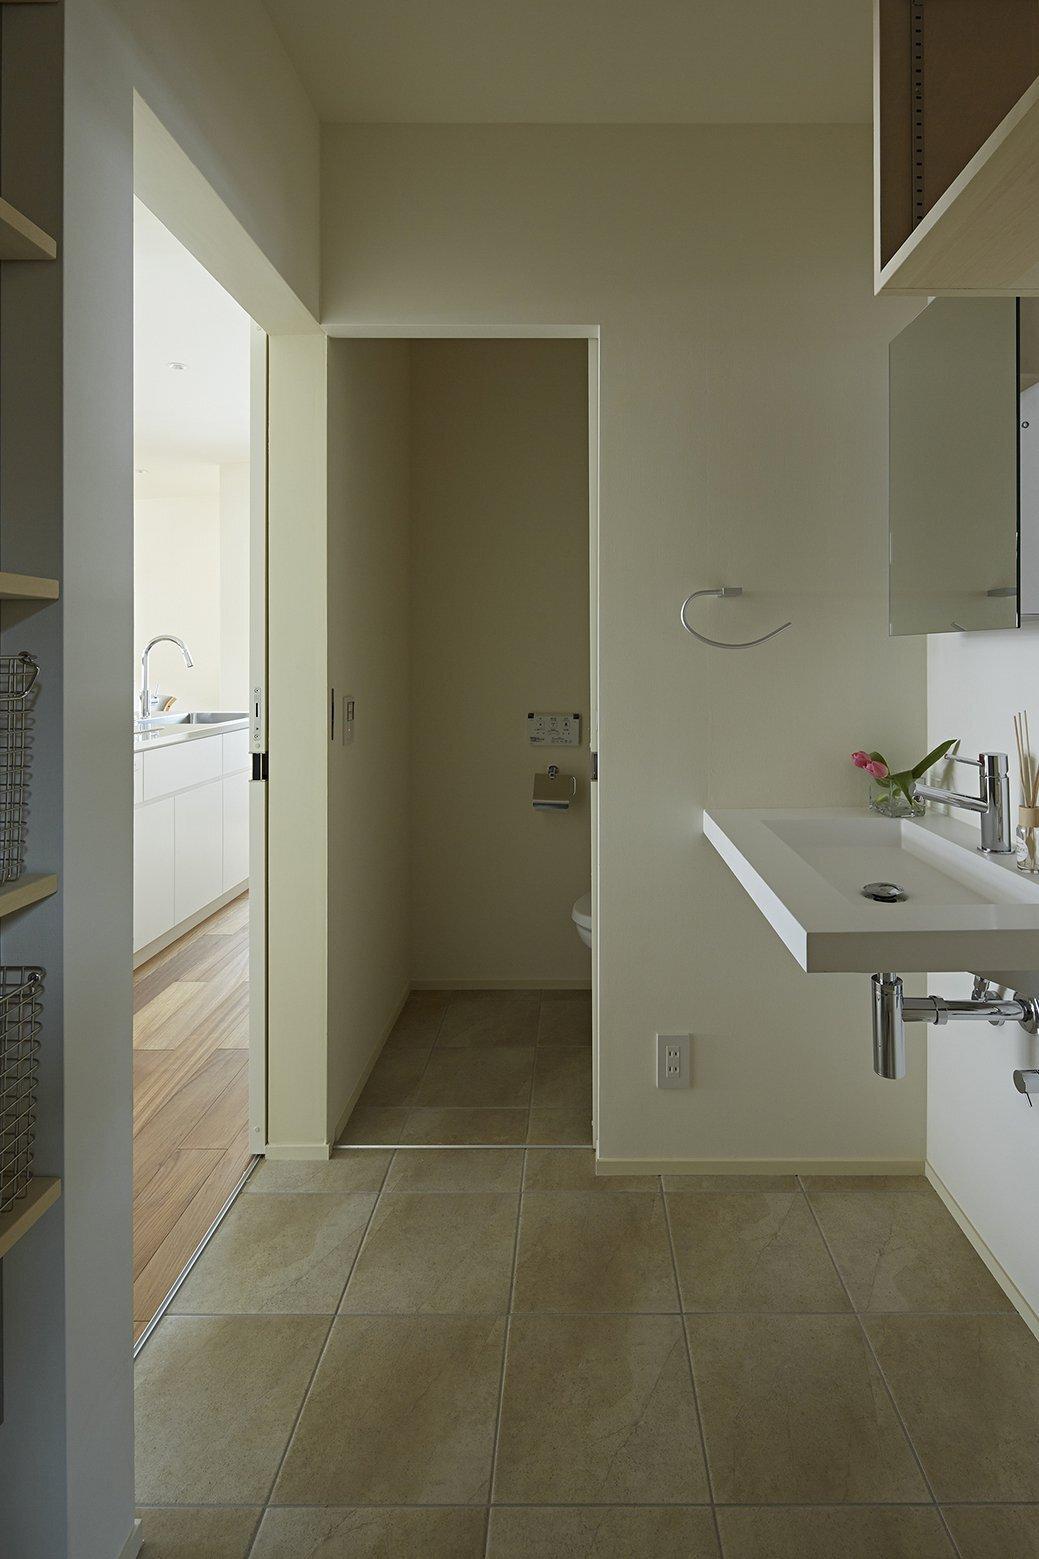 Checkered House - Takeshi Shikauchi Architect Office - Tokyo - Bathroom - Humble Homes